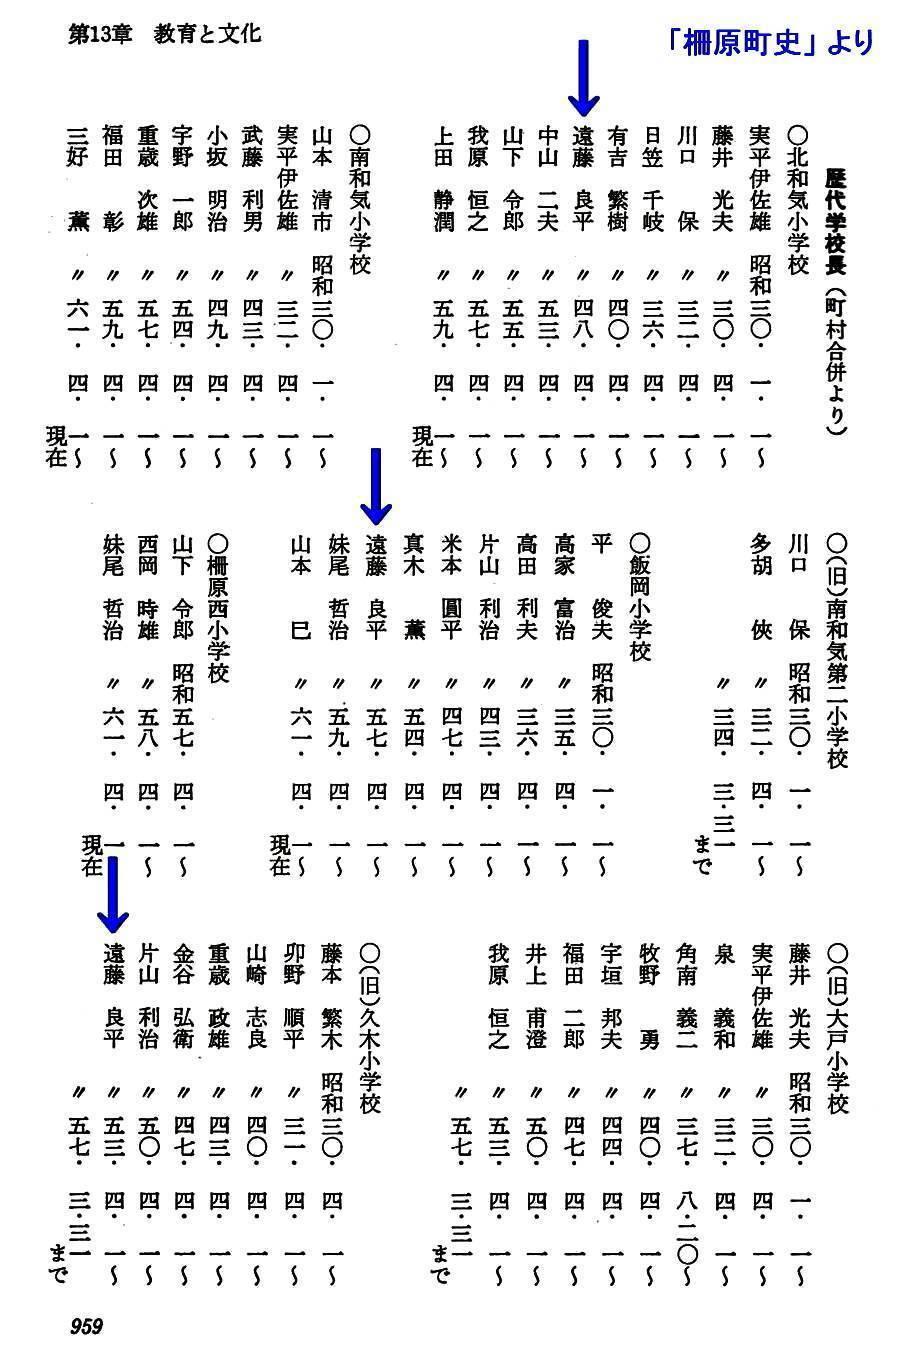 FC0747-04.jpg